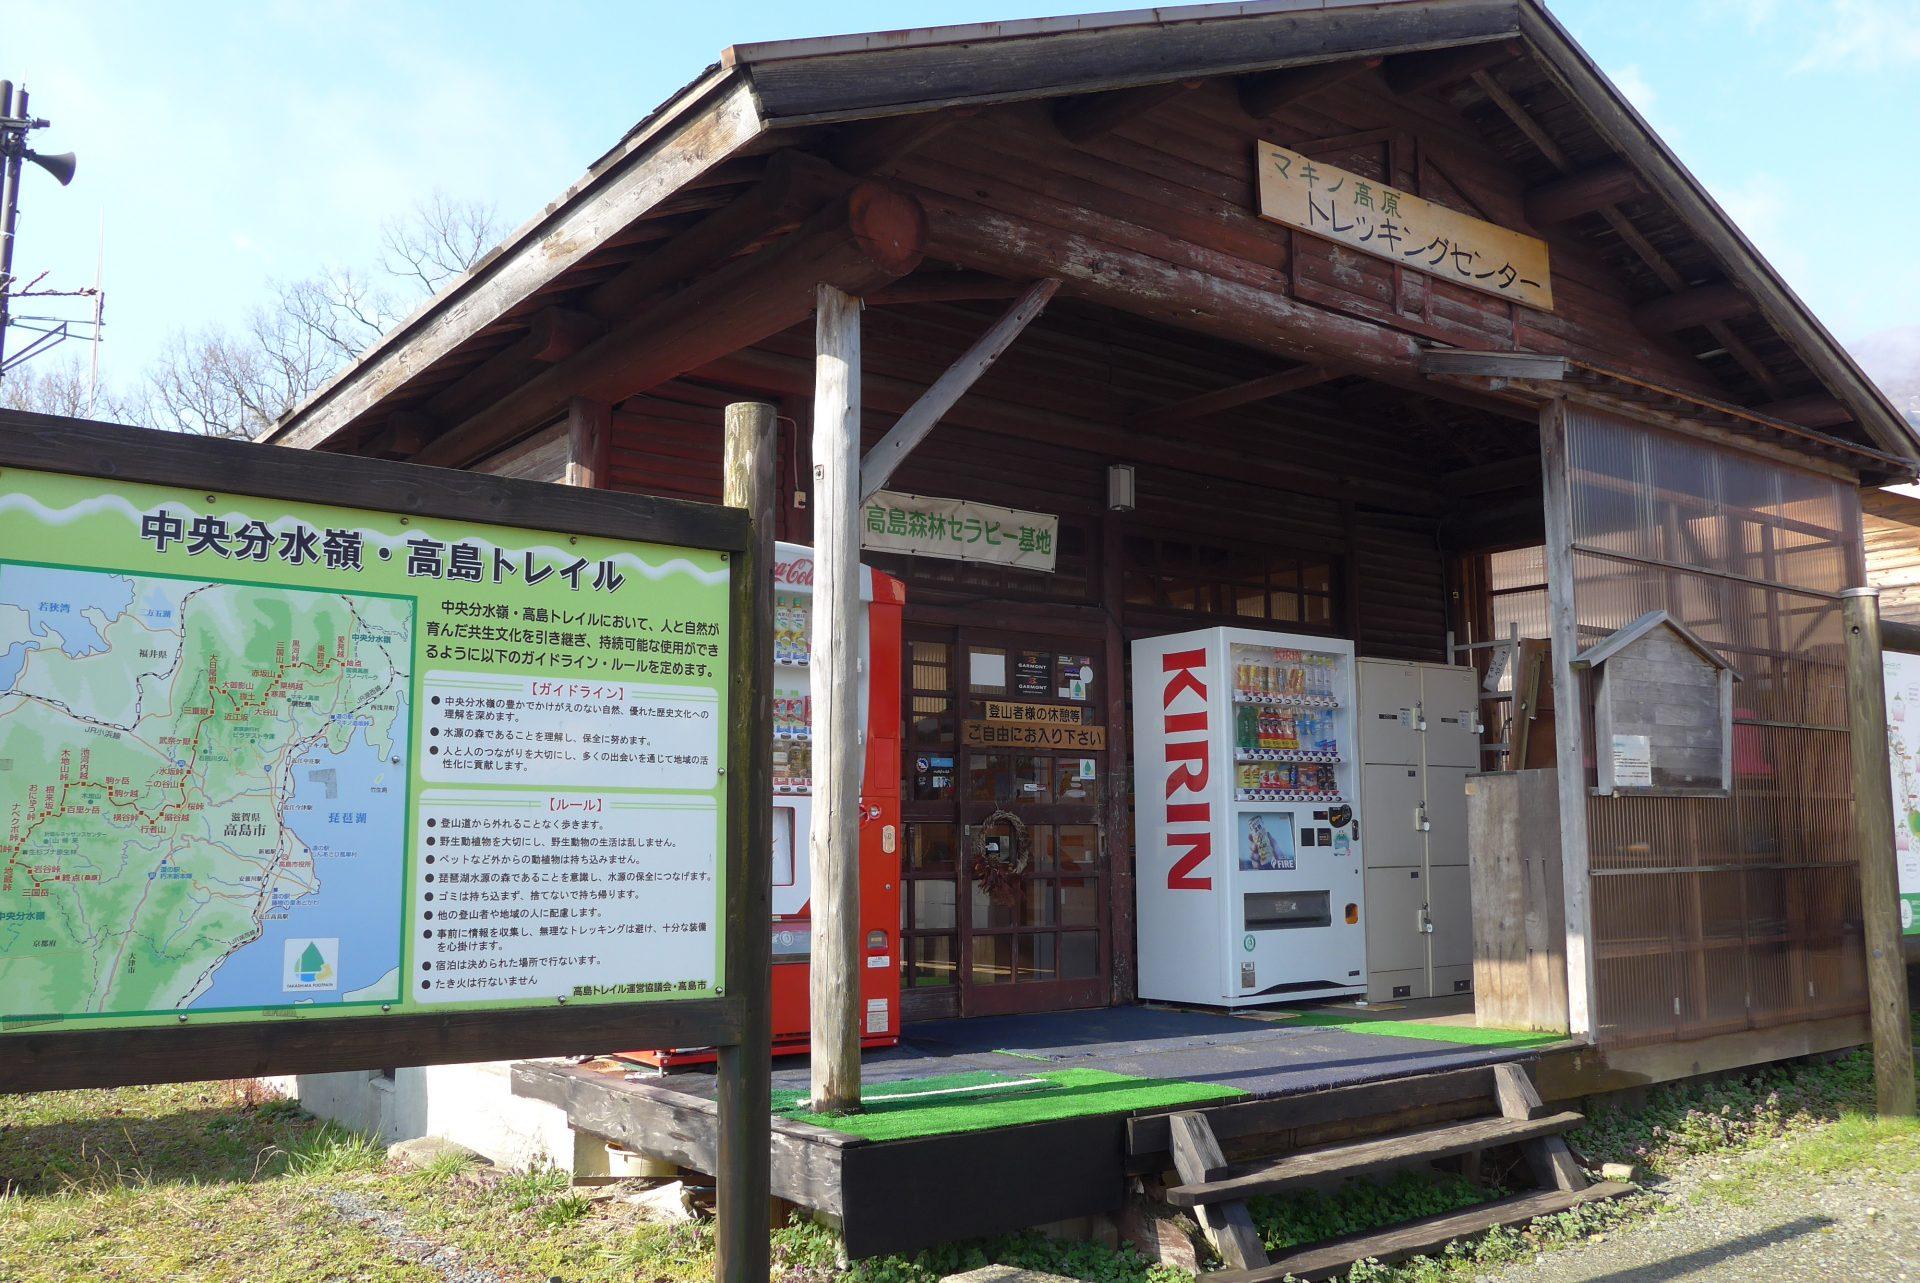 (K)観光スポット近く便利なマキノ高原温泉さらさ!大駐車場も完備